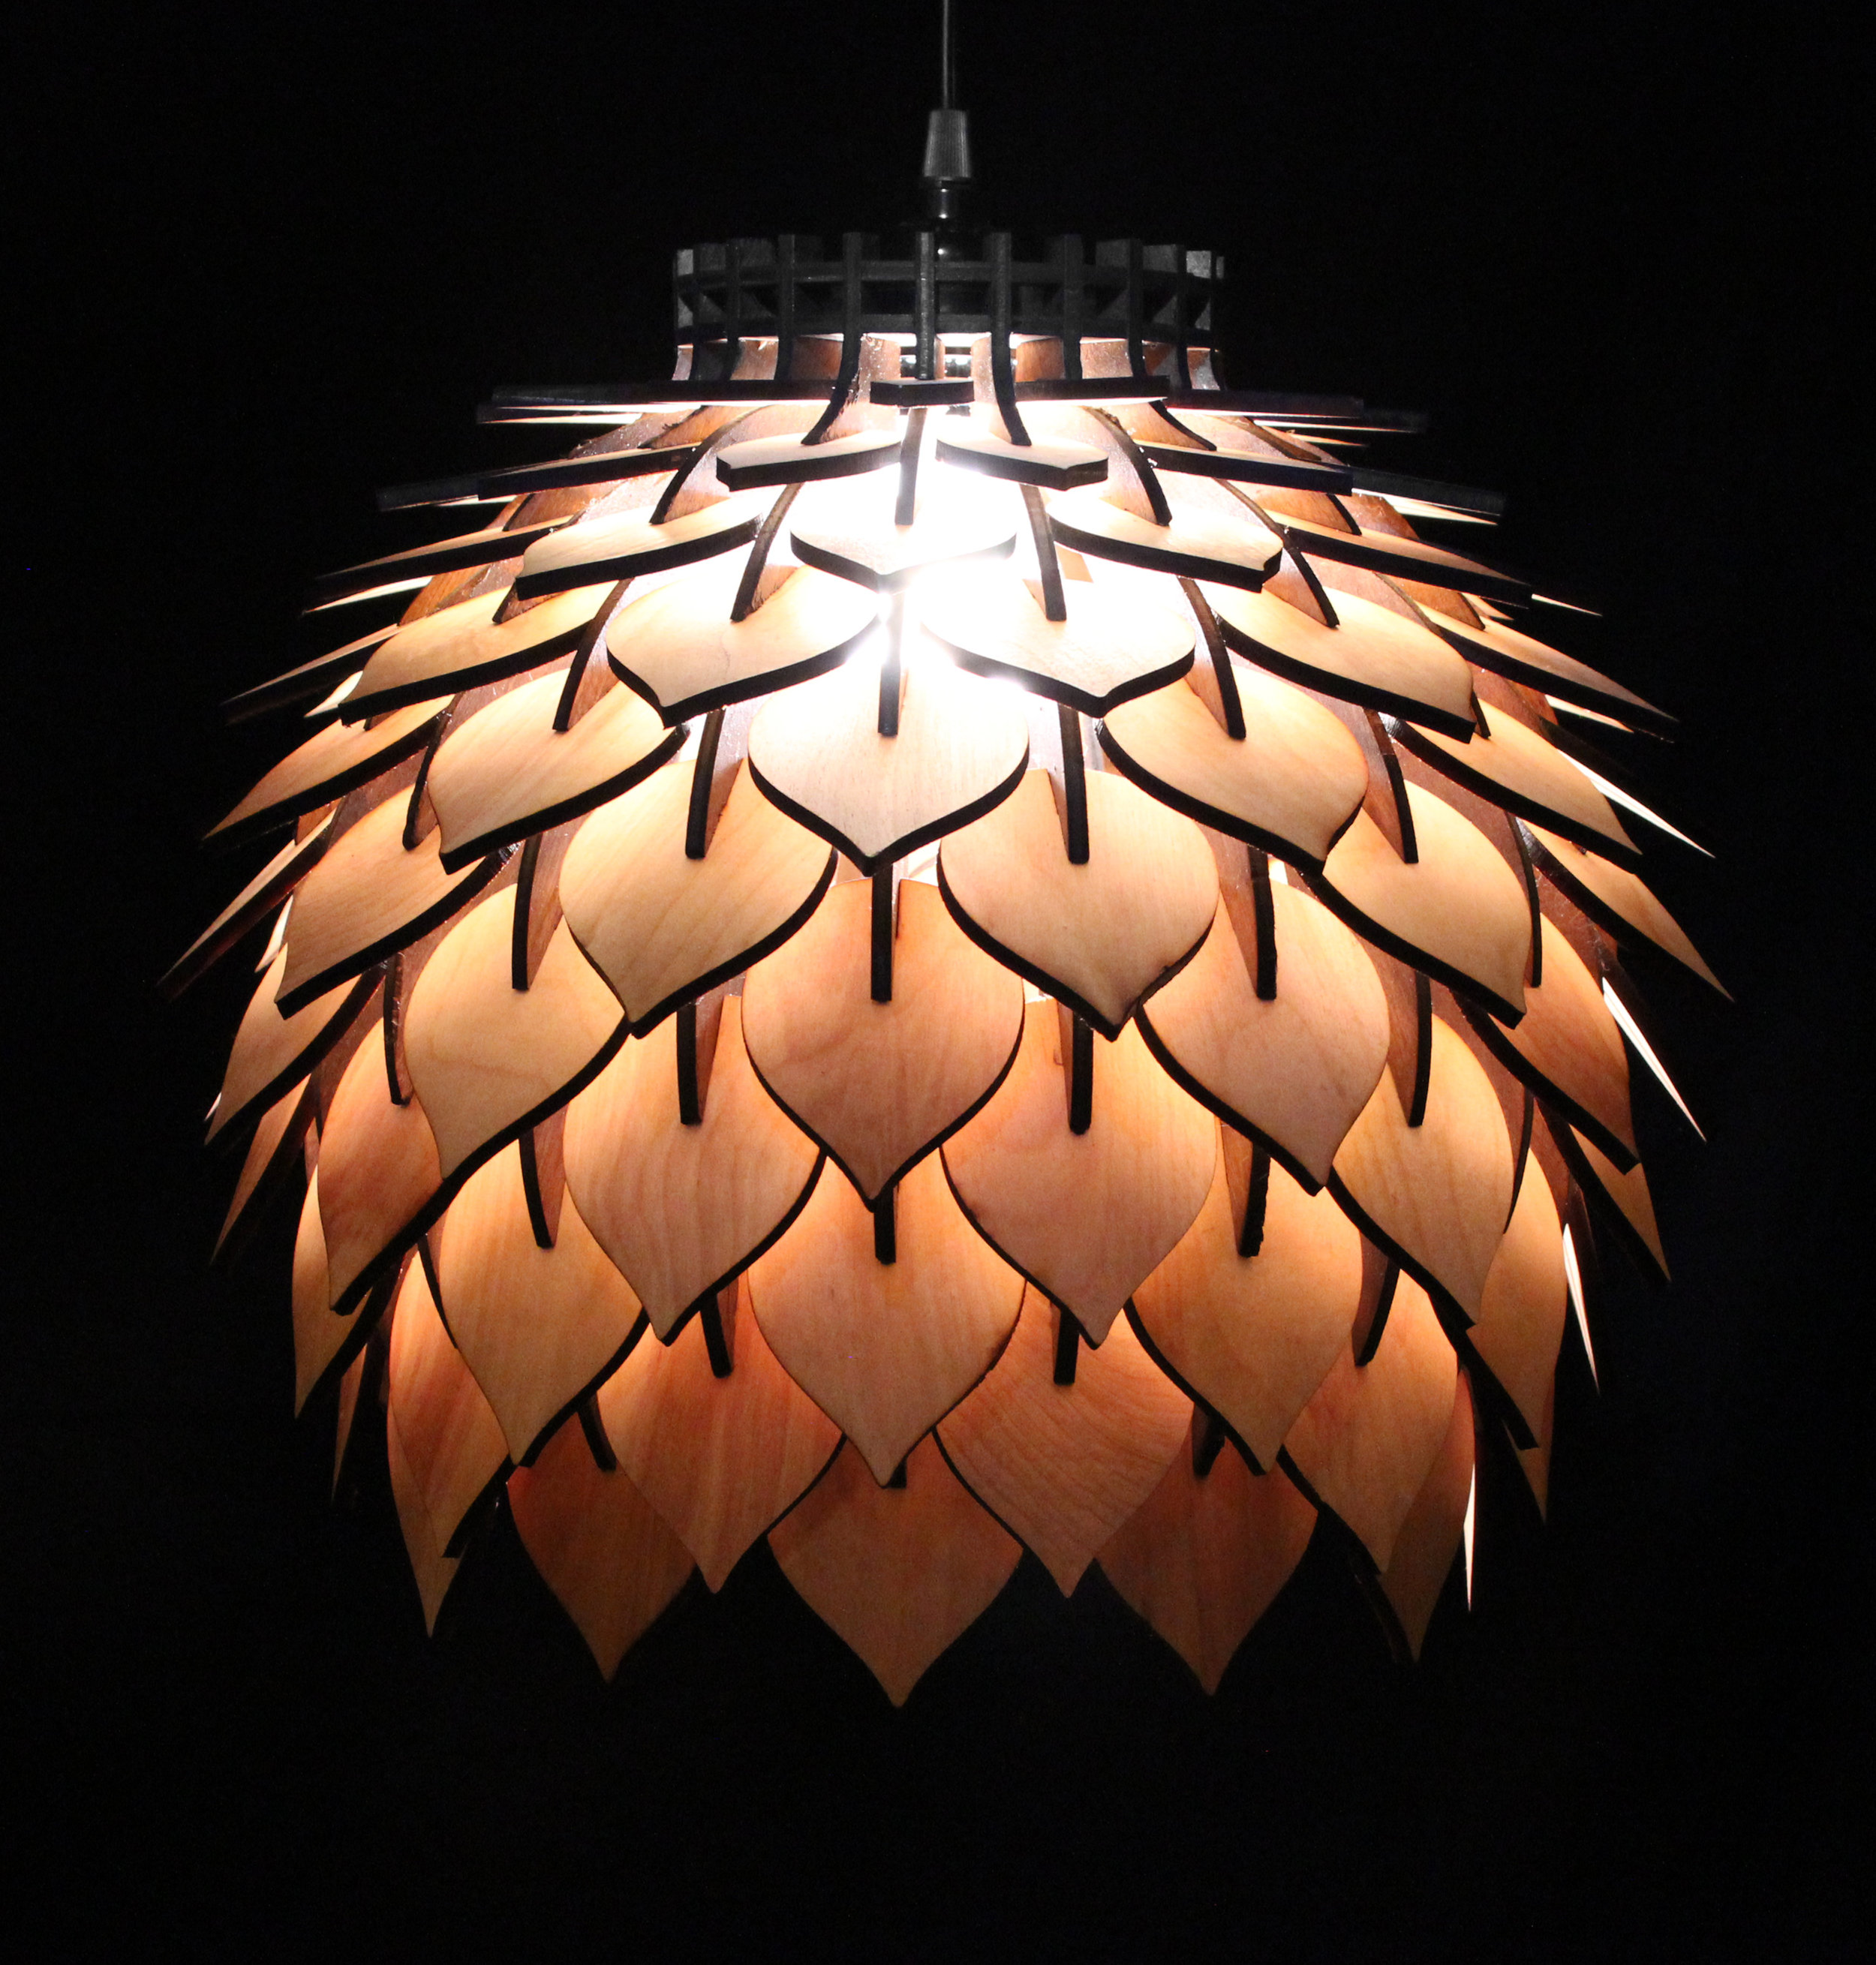 spore lamp 2 – handmade laser cut parametric postmodern interior light geometric wooden pendant lamp terraform design.jpg